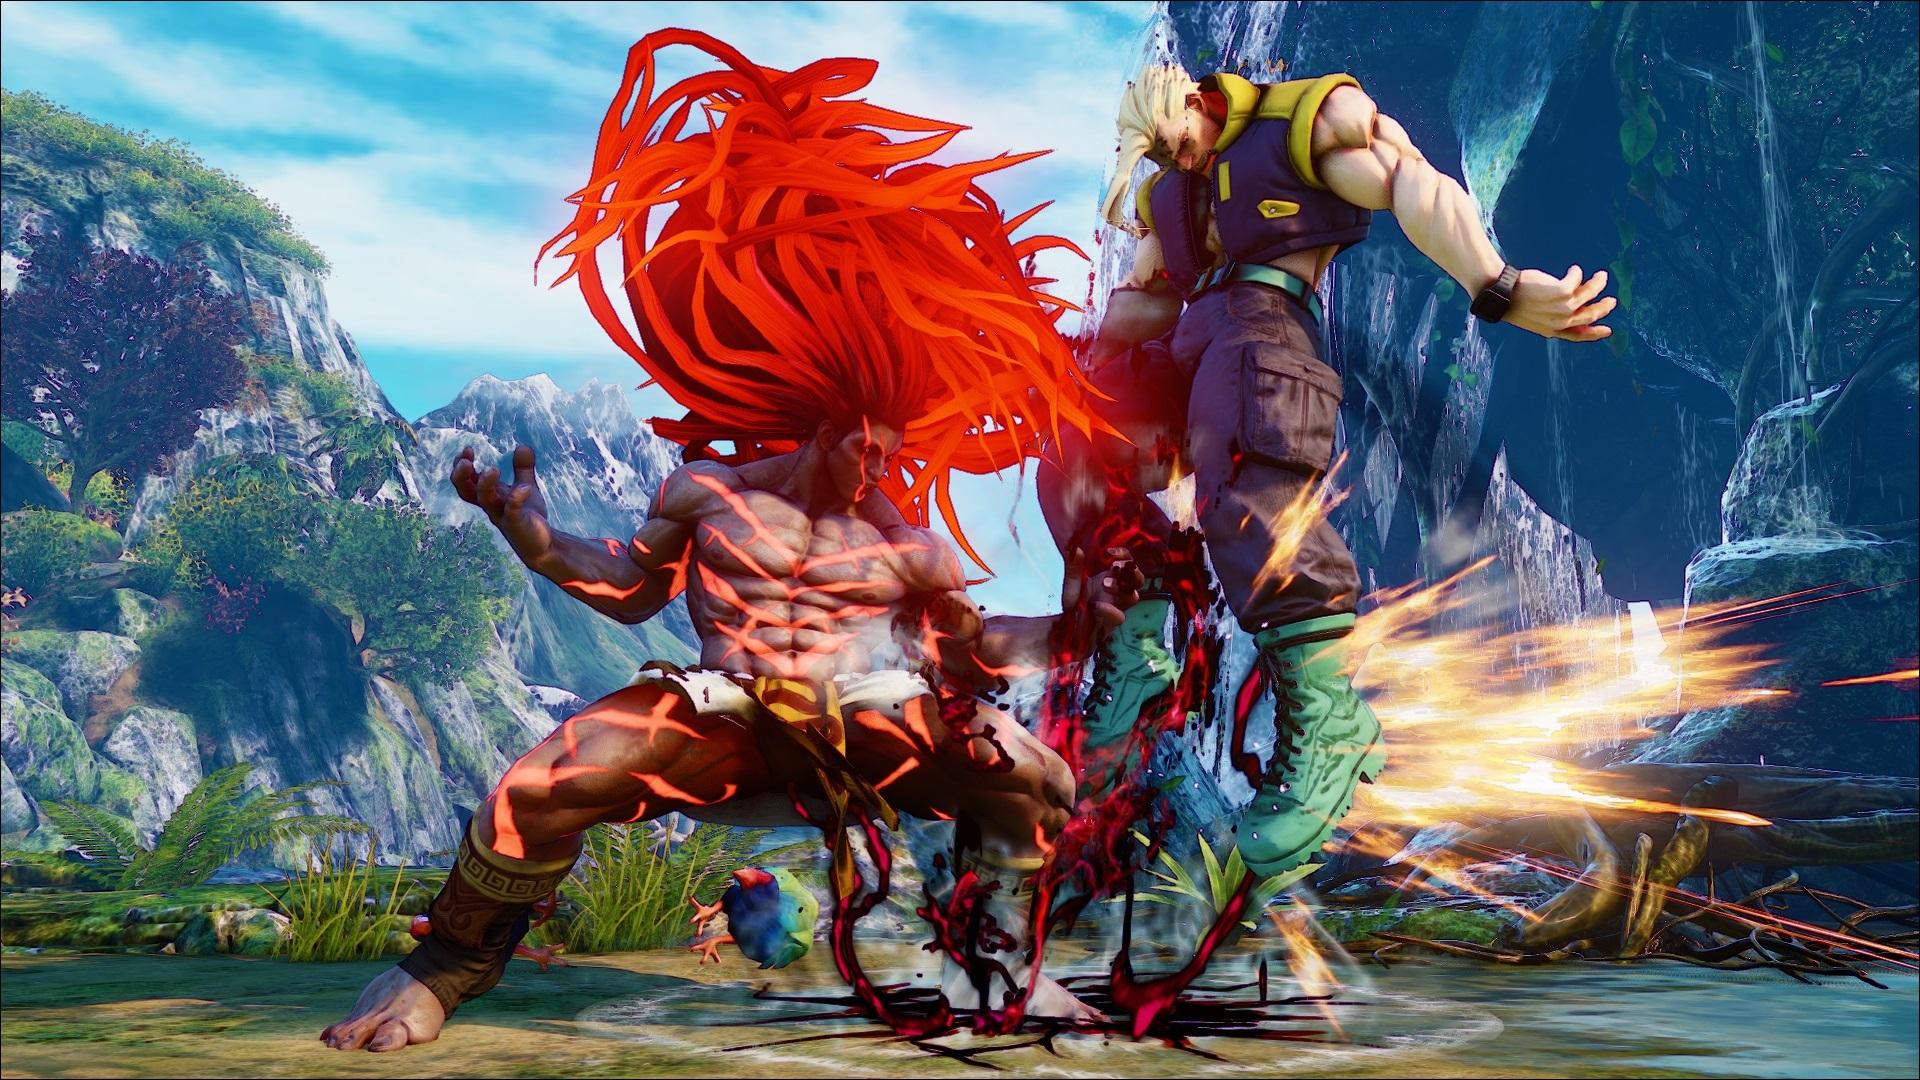 Street-Fighter-V-screens